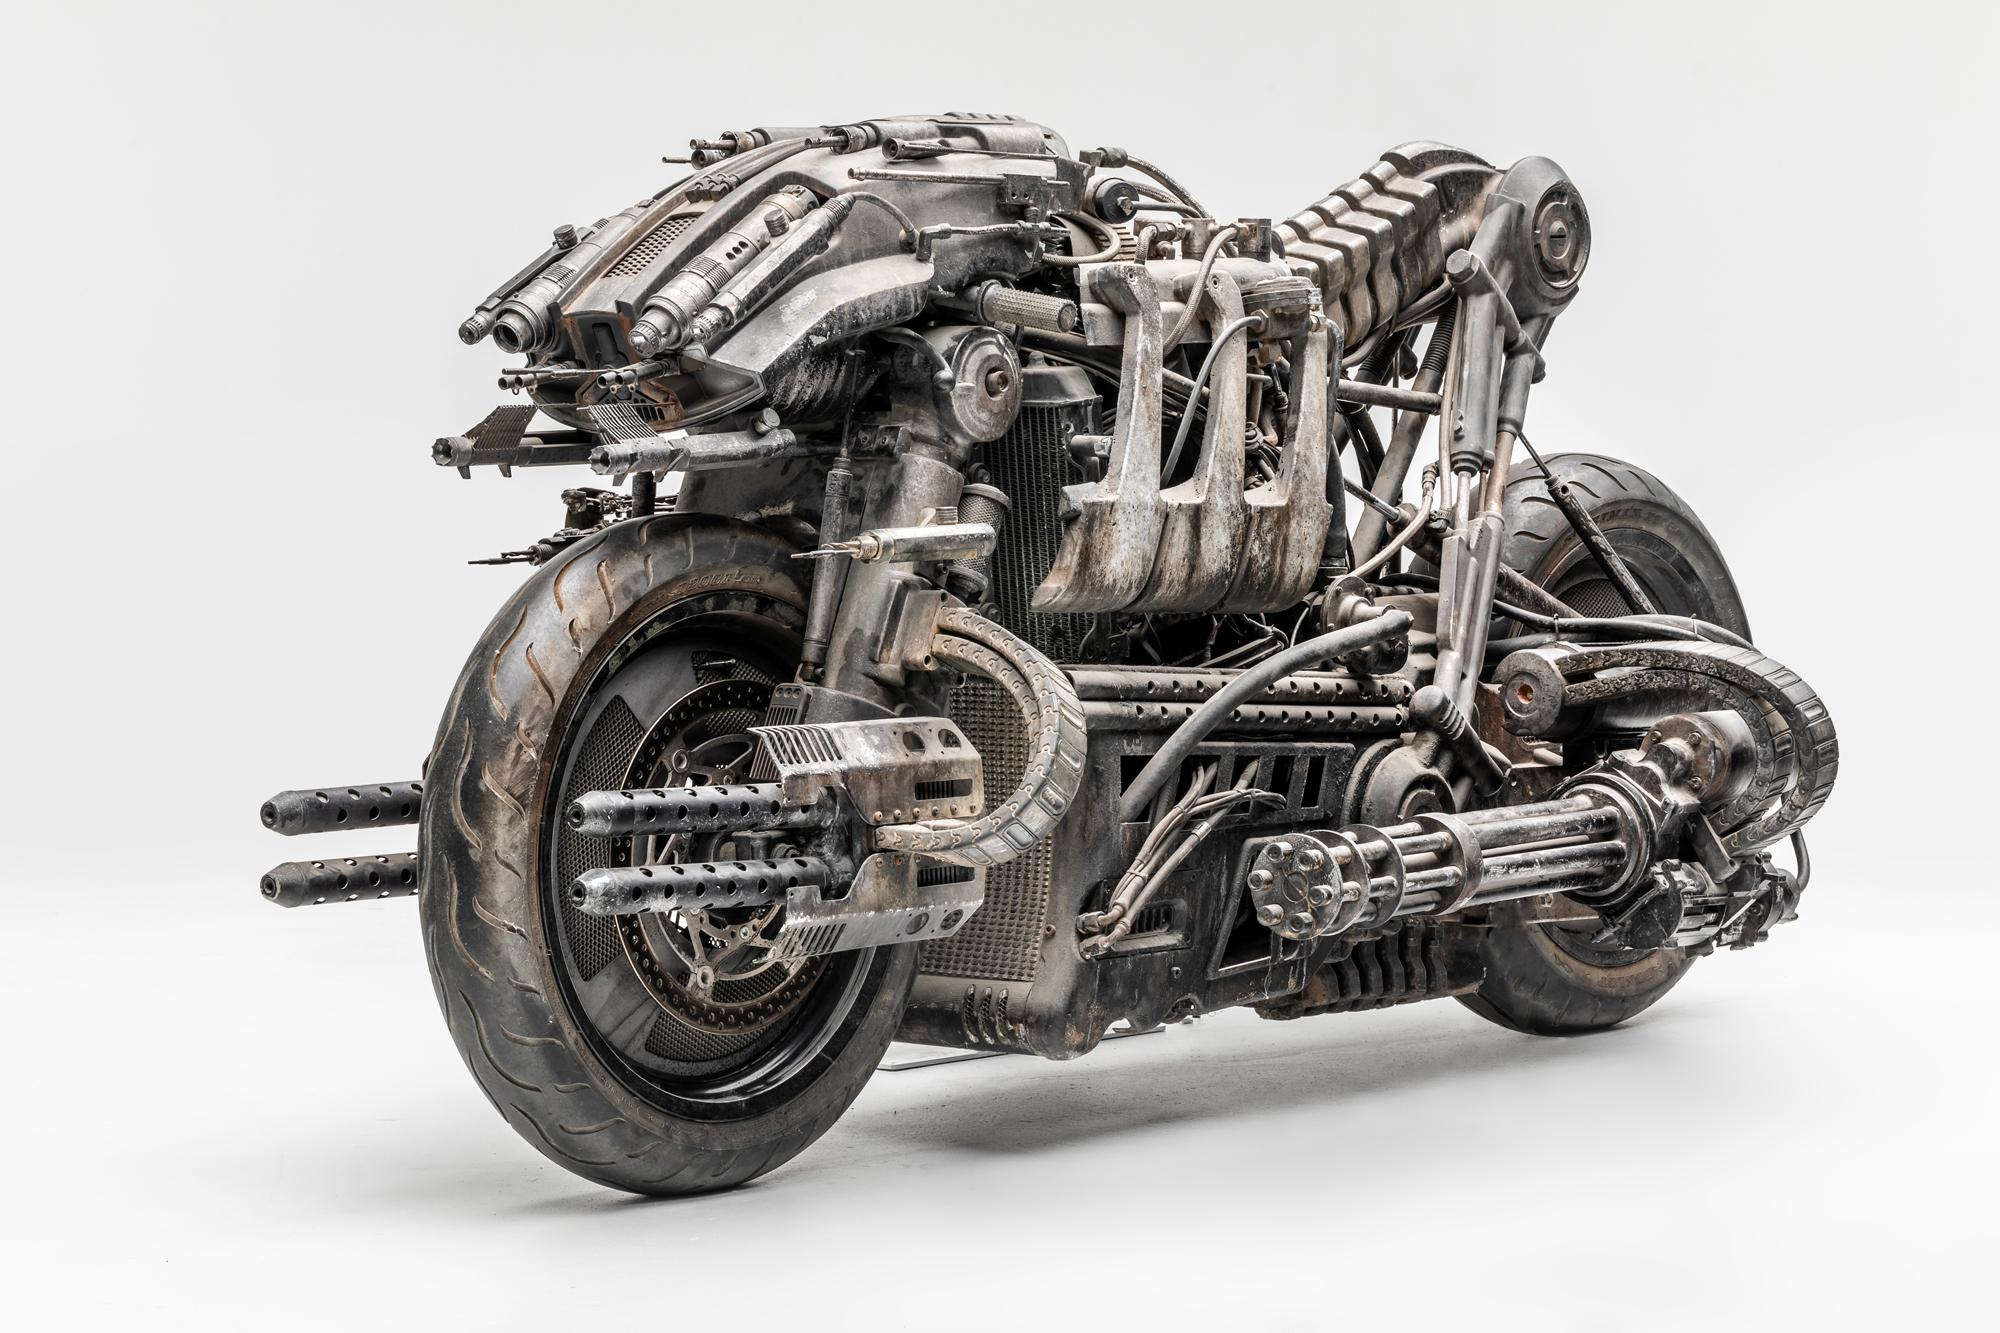 terminator-motorcycle-1-2000